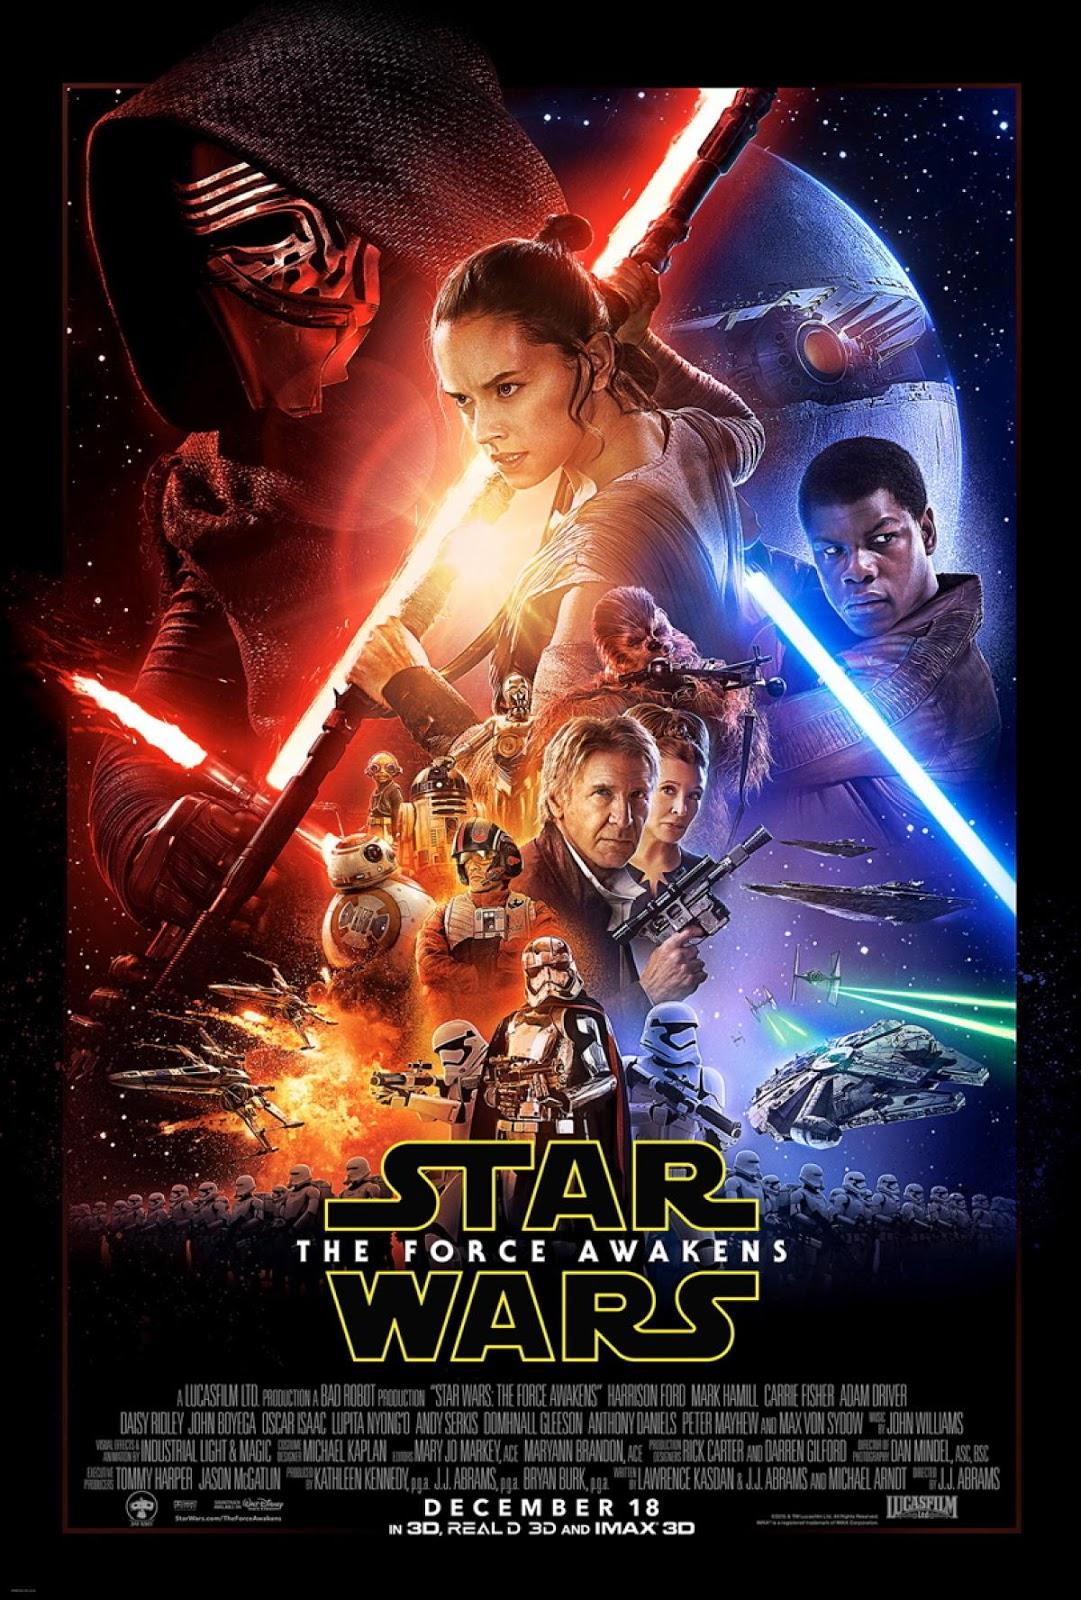 Star Wars: Episode VII - The Force Awakens (2015) ταινιες online seires oikamenoi greek subs